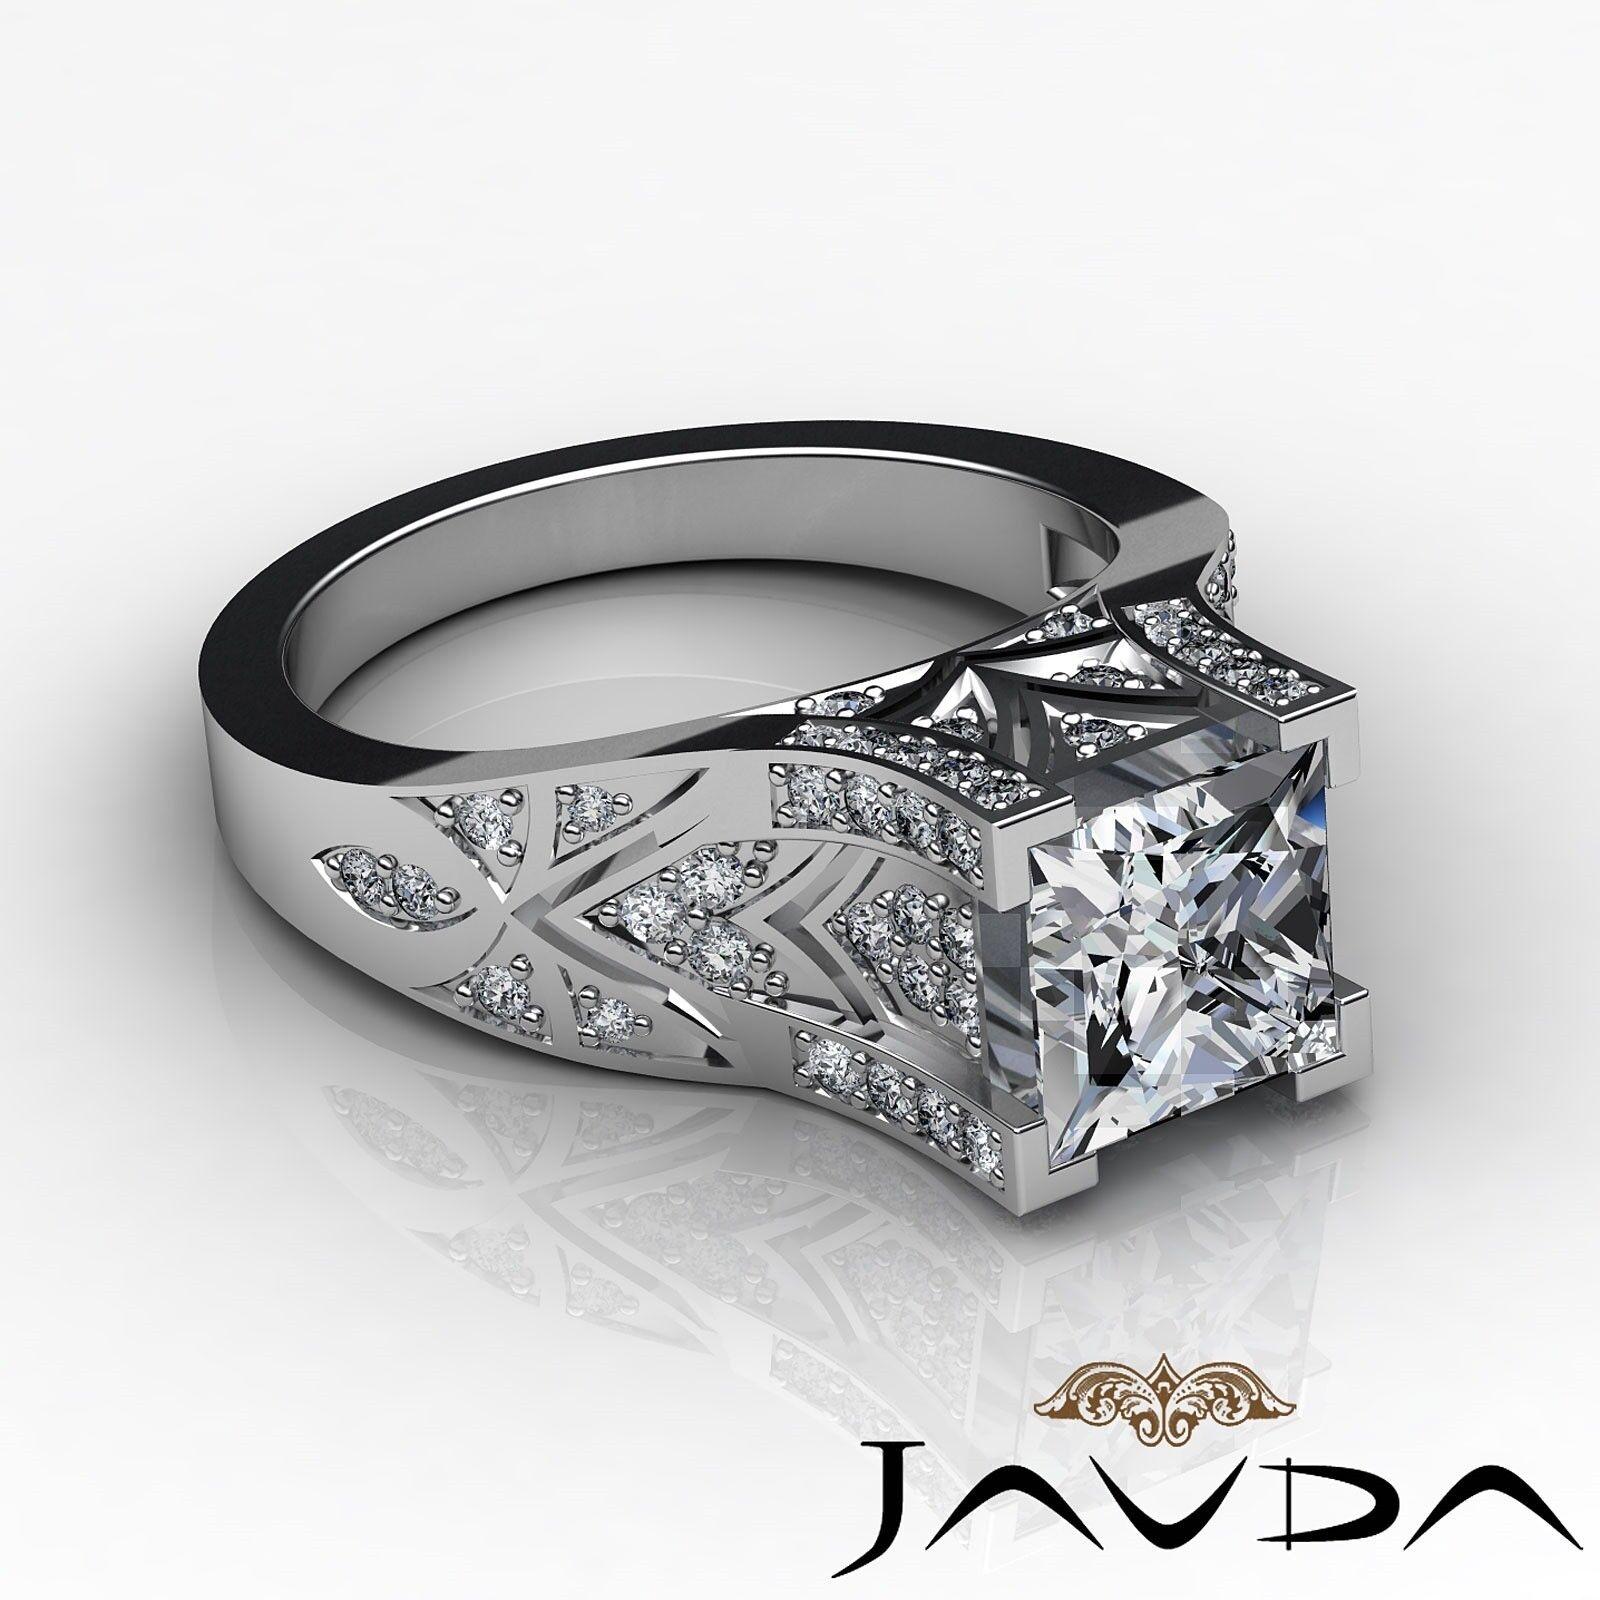 1.5ctw Antique Pave Princess Diamond  Engagement Ring GIA F-VS1 White Gold 2